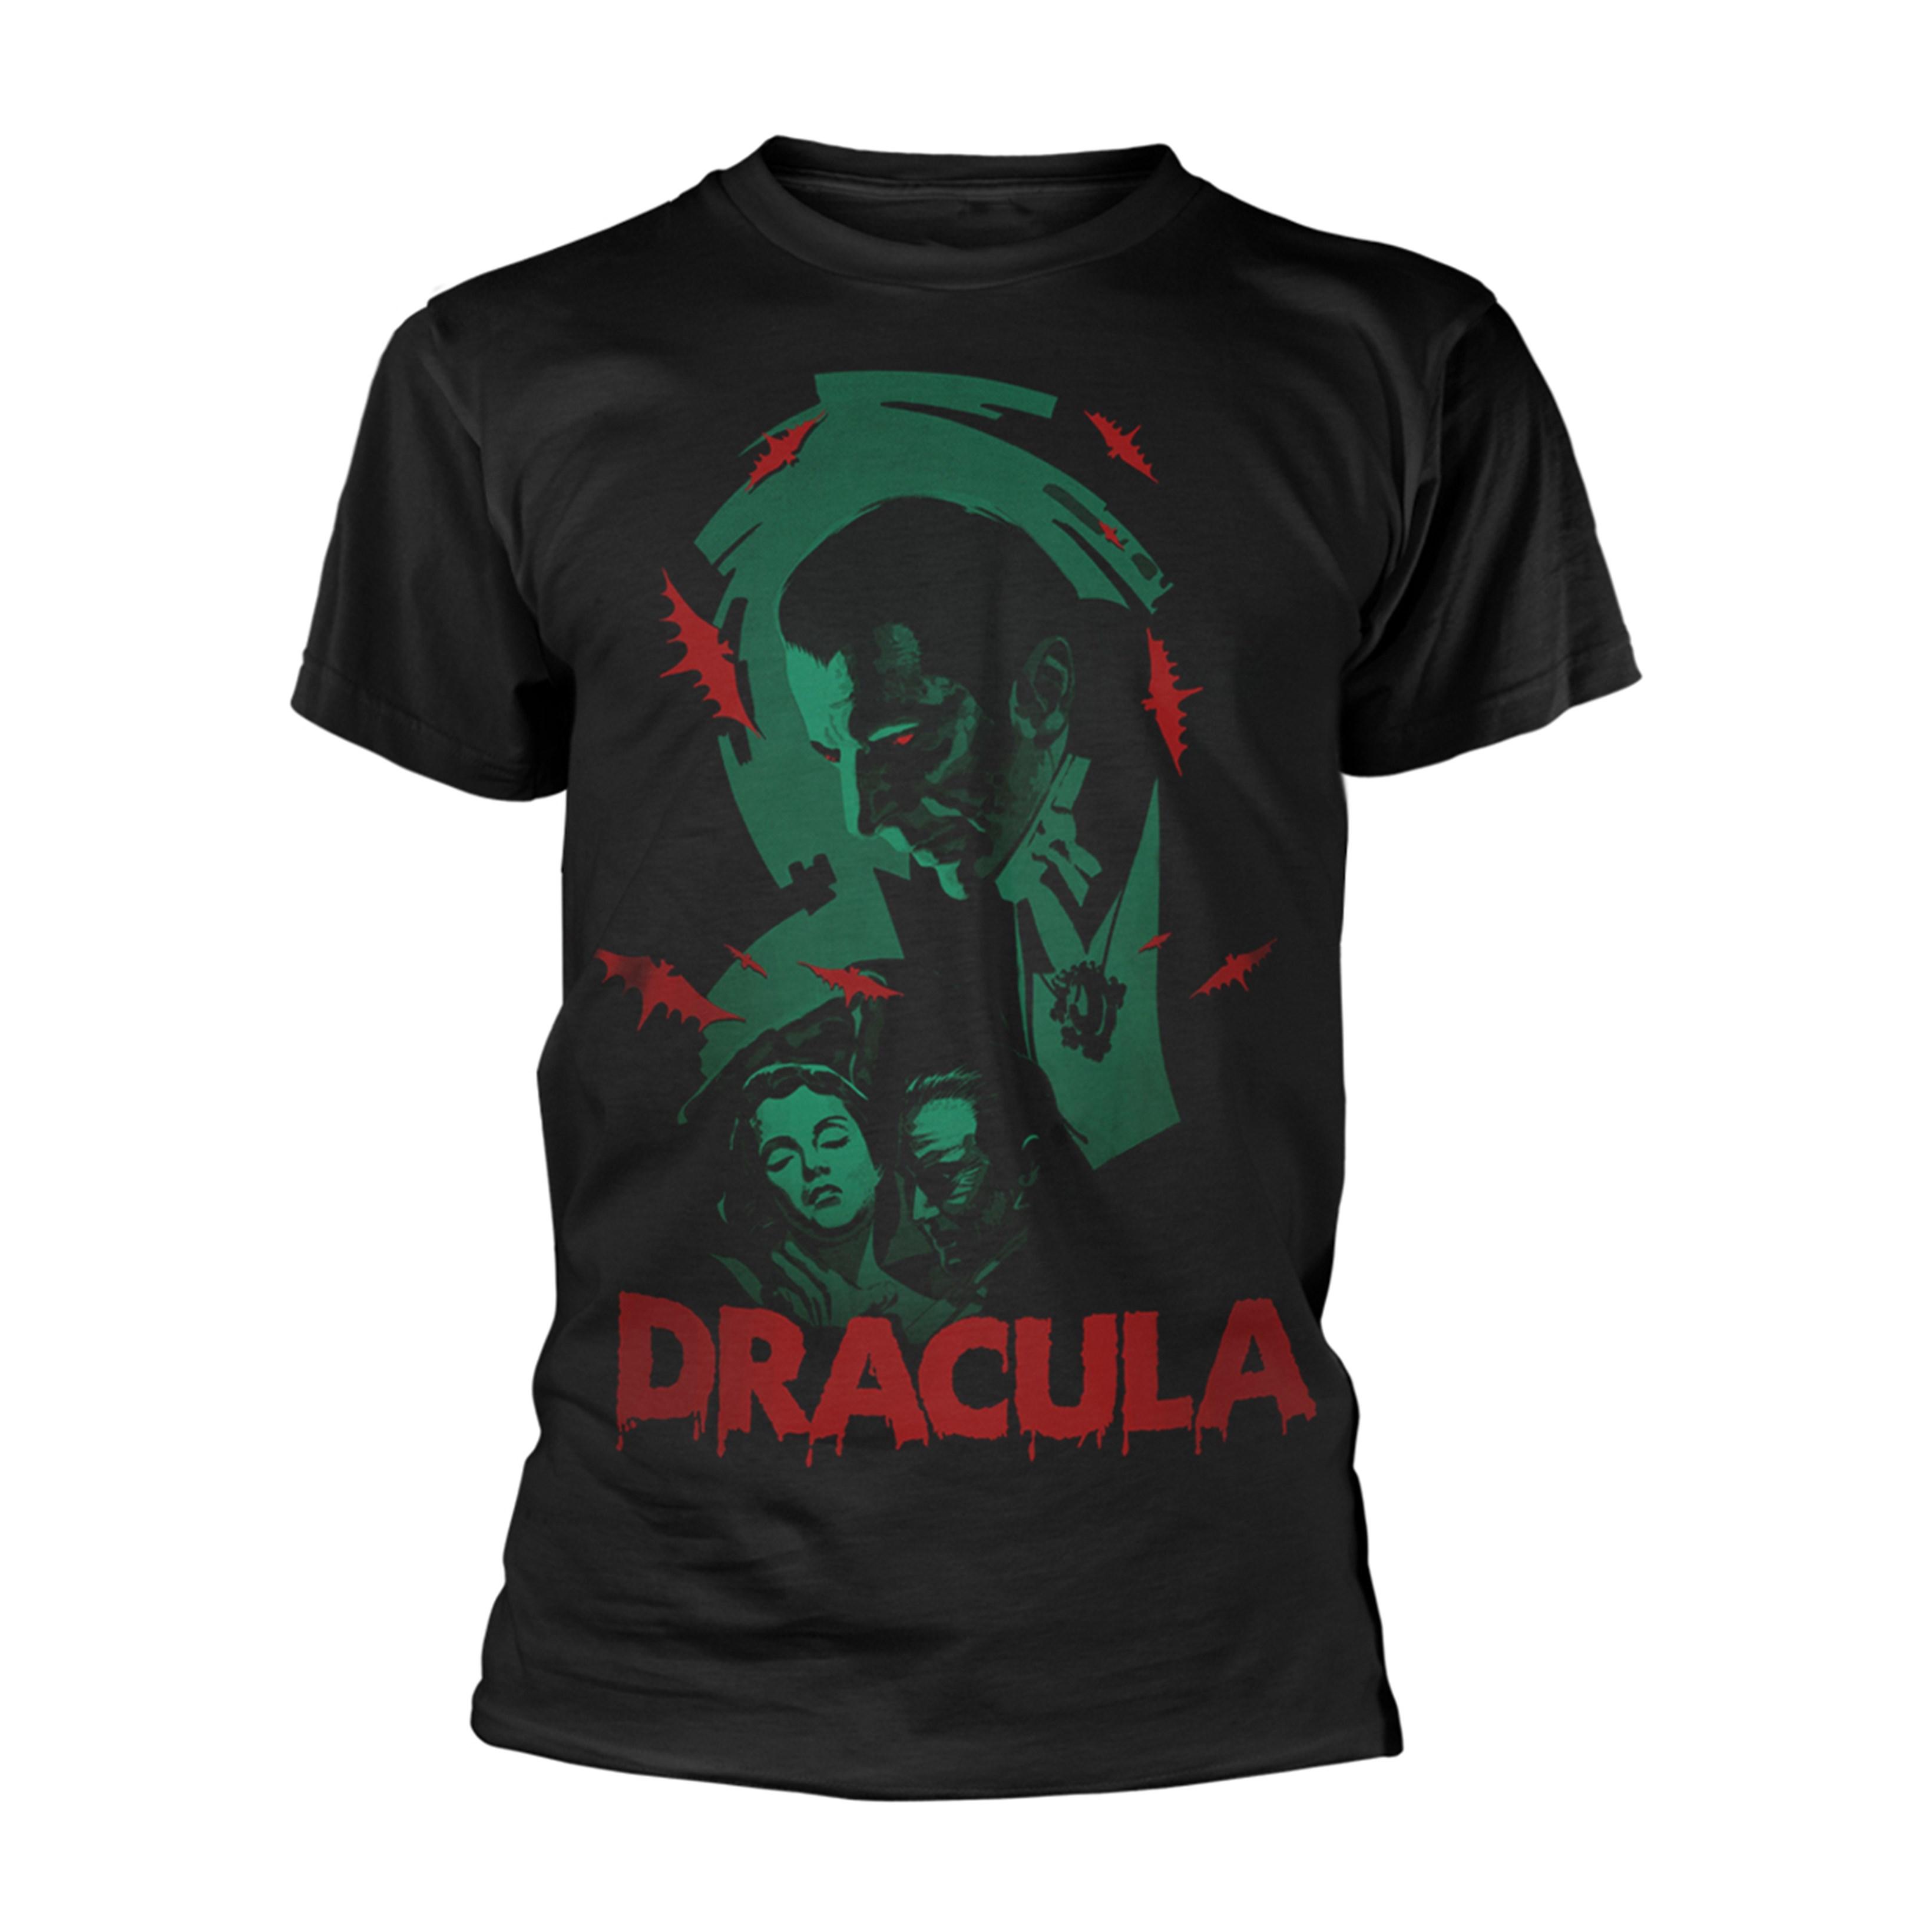 Plan 9: Luna Dracula (Small) - 1